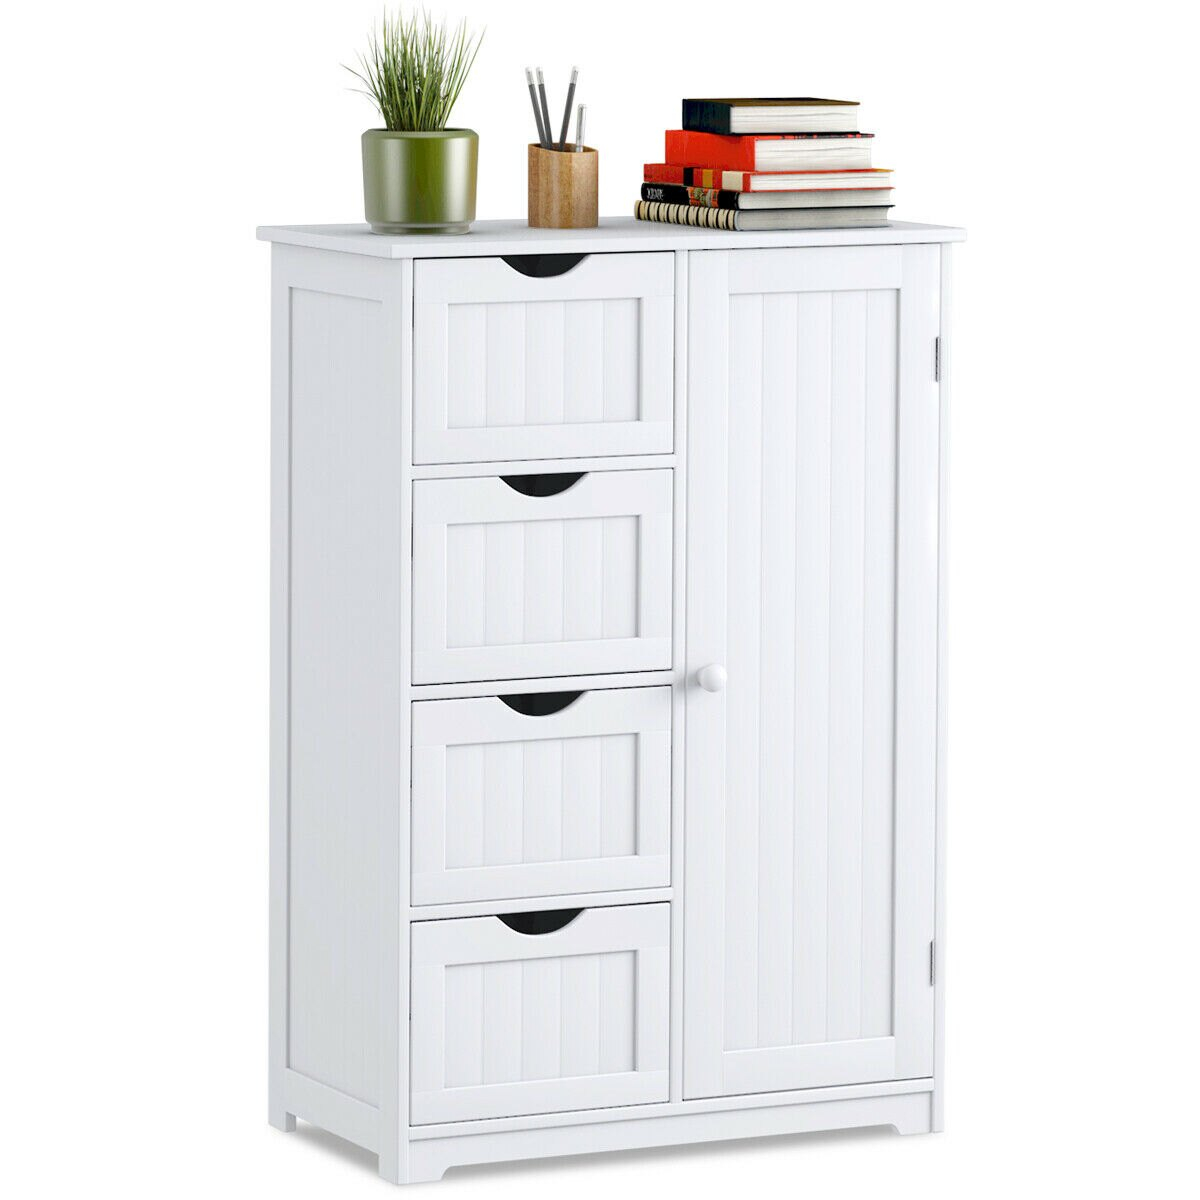 Costway Costway Wooden 4 Drawer Bathroom Cabinet Storage Cupboard 2 Shelves Free Standing White Rakuten regarding size 1200 X 1200